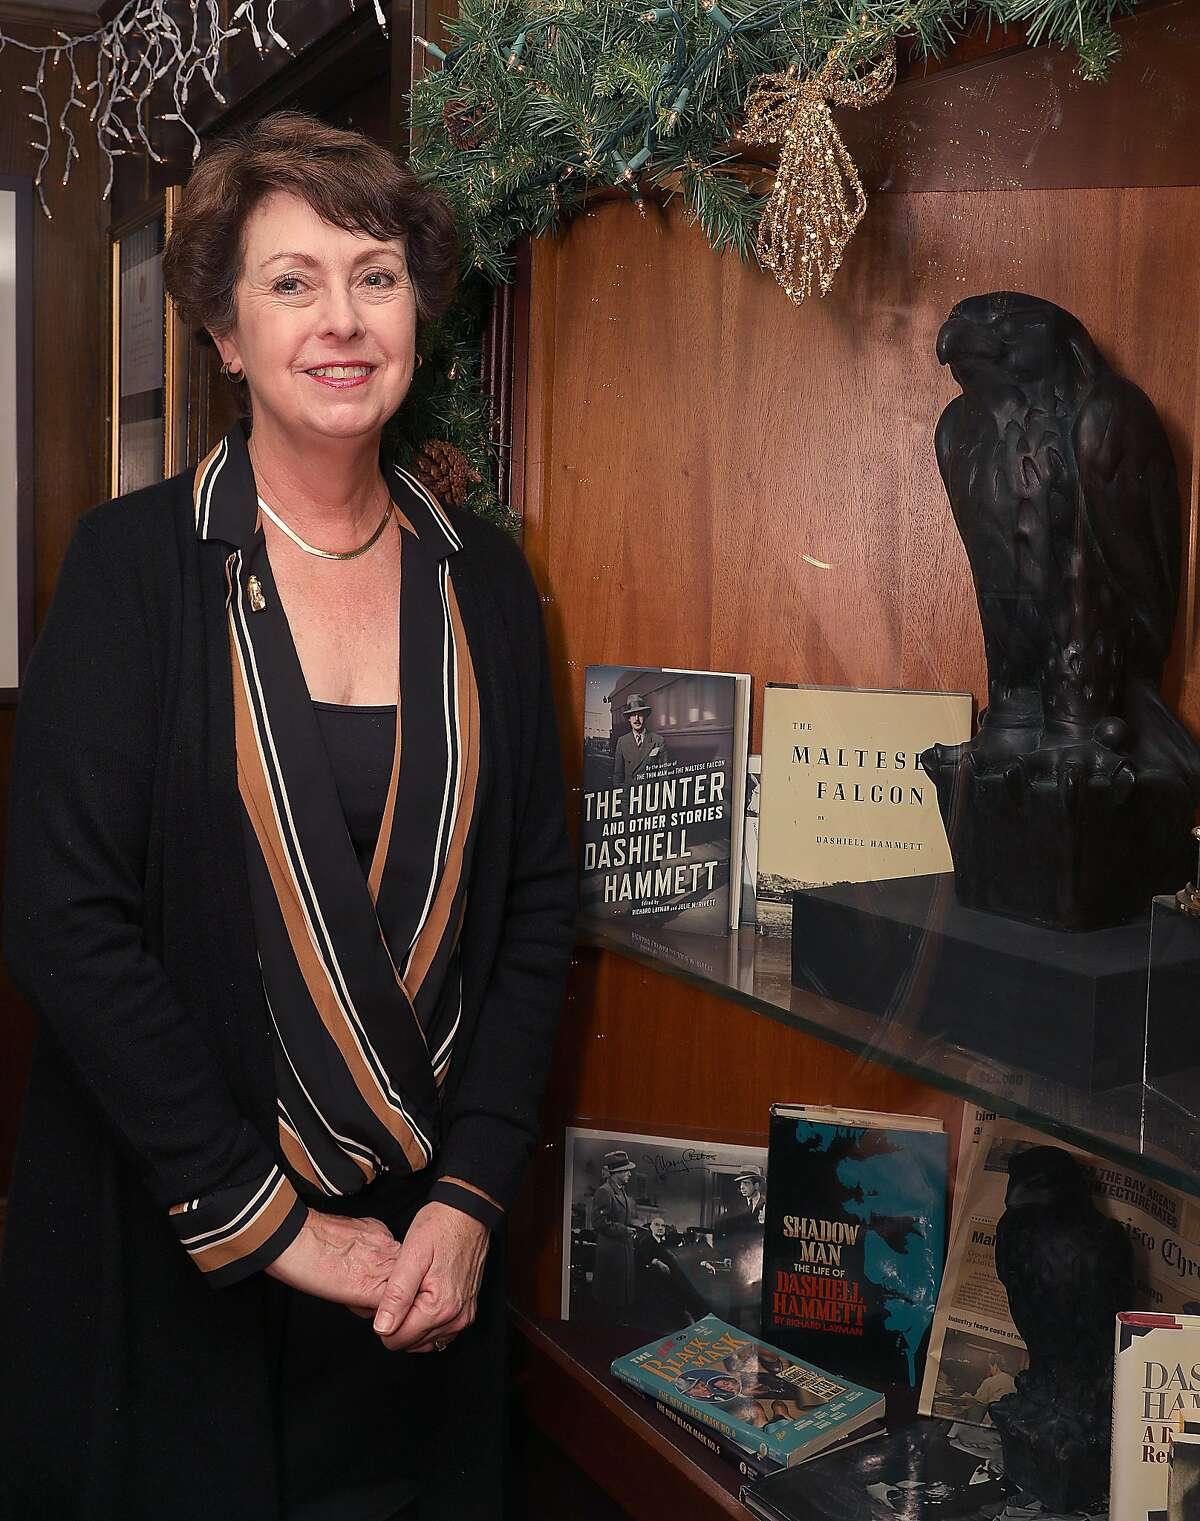 Julie Rivett, granddaughter of author Dashell Hammett shows the Maltese Falcon at John's Grill made famous by Hammett's detective novel as John's Grill celebrates its 110th anniversary on Thursday, Nov. 29, 2018, in San Francisco, Calif.